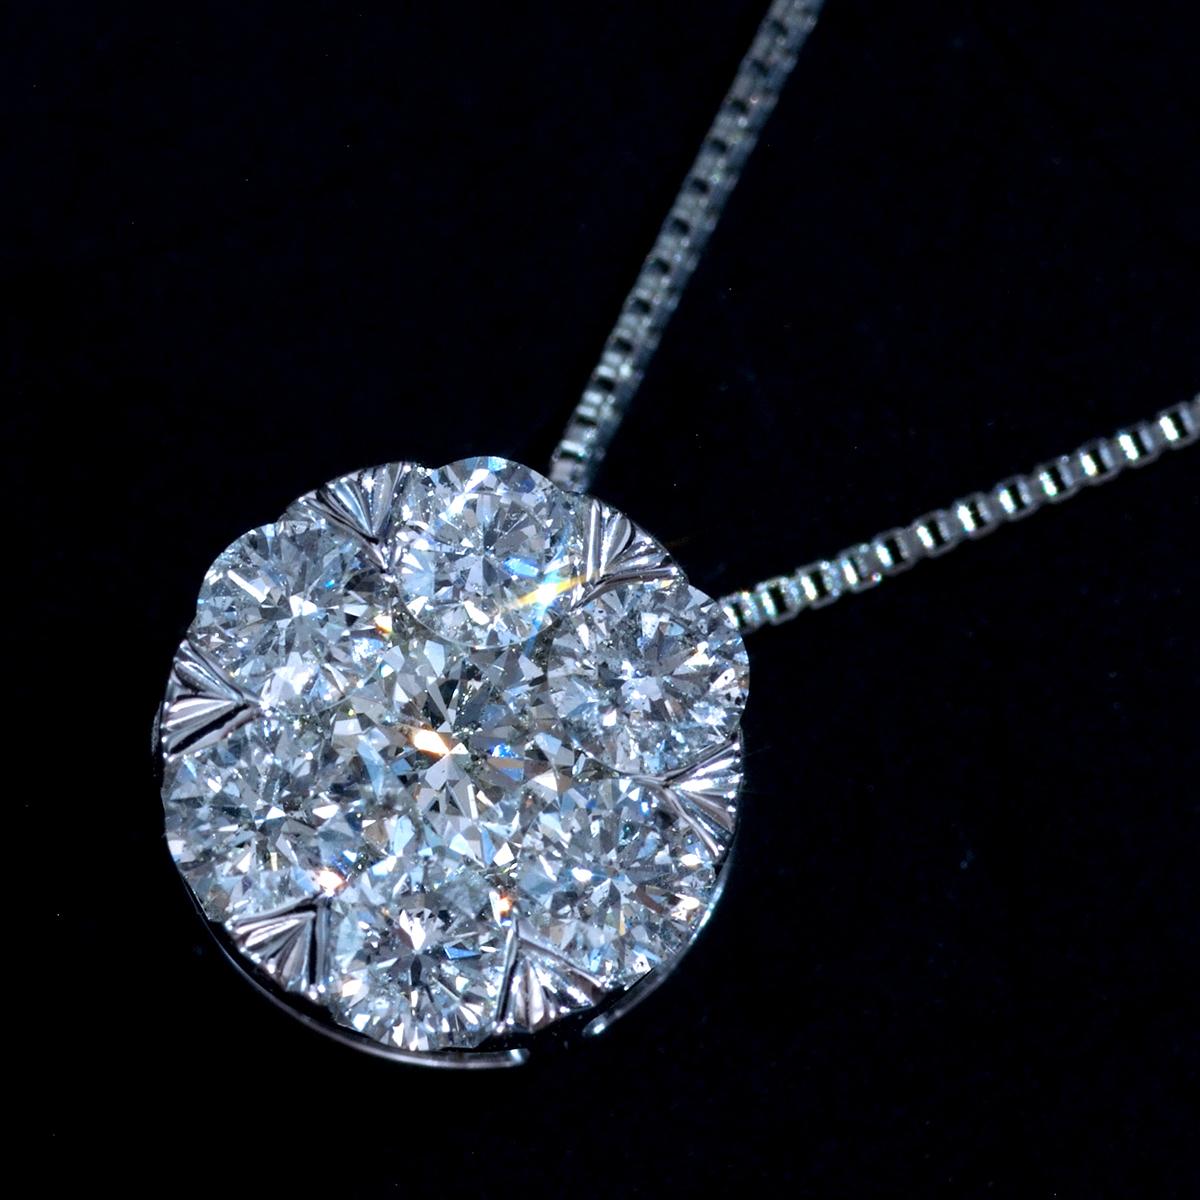 *PN5643 新品!業者向け令和新作Design! 天然上質ダイヤモンド0.60ct 最高級18金WG無垢ネックレス